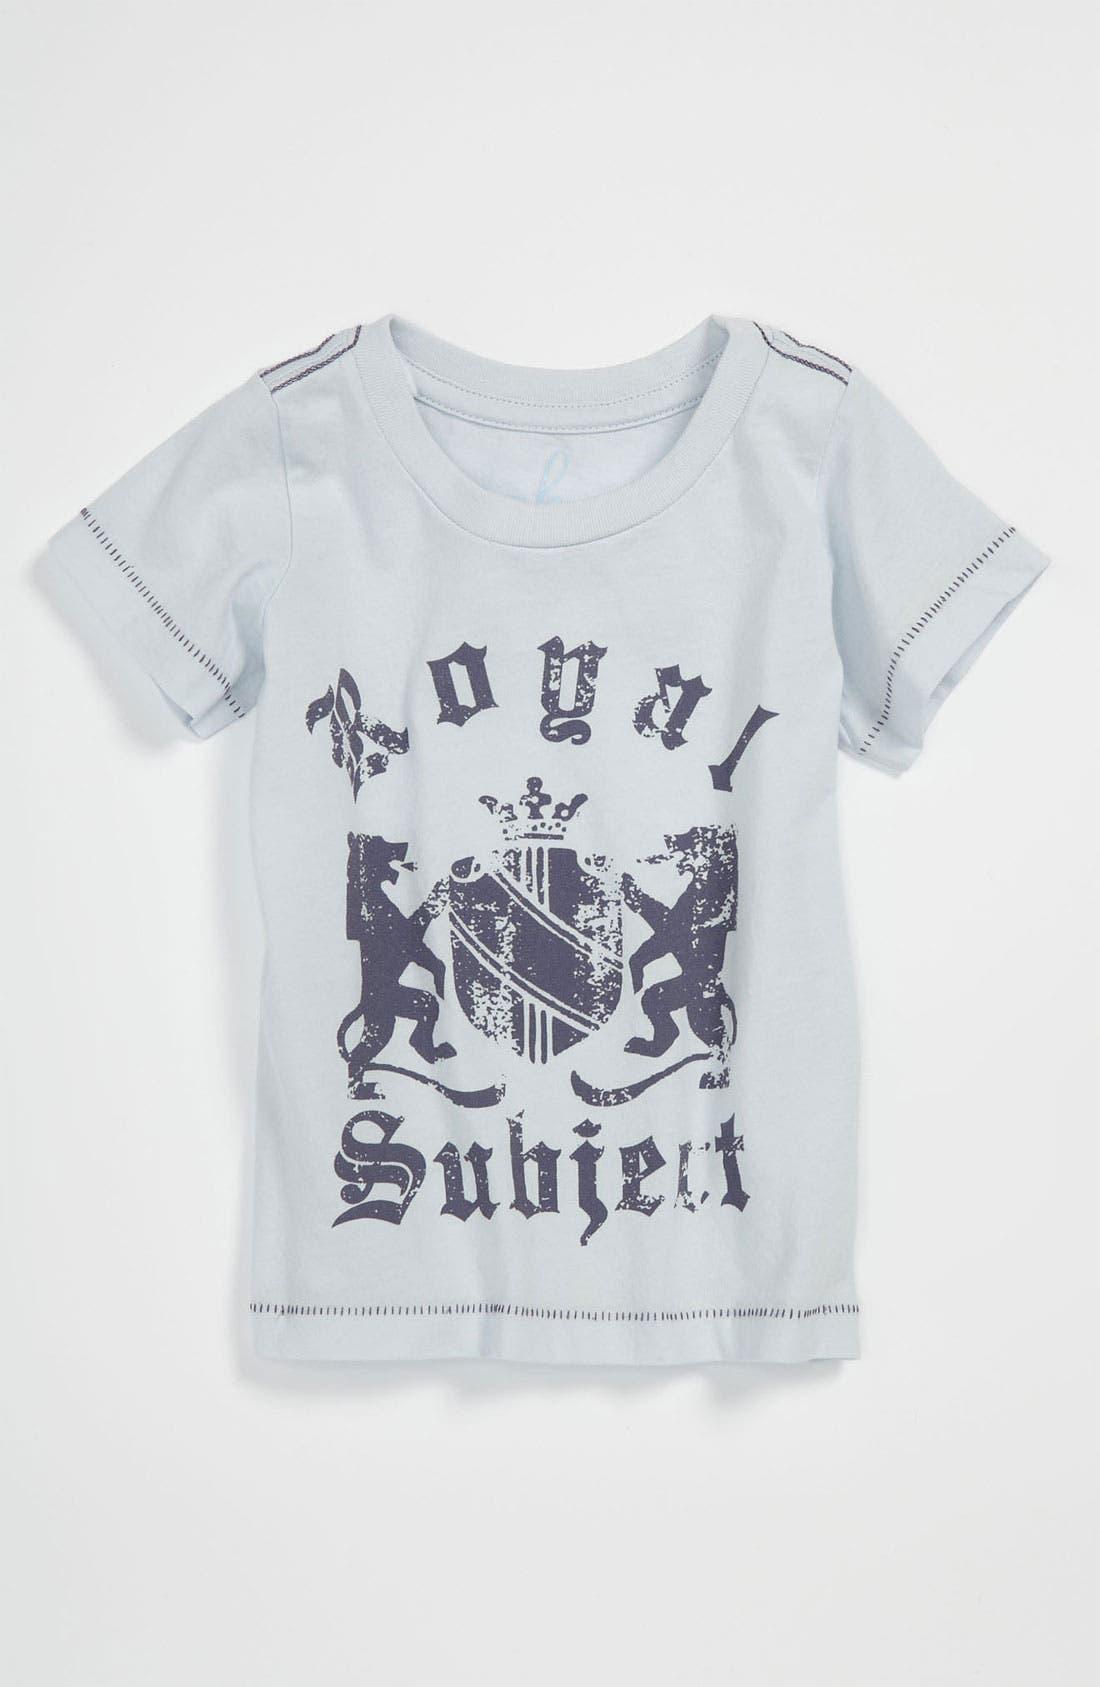 Alternate Image 1 Selected - Peek 'Royal Subject' T-Shirt (Infant)